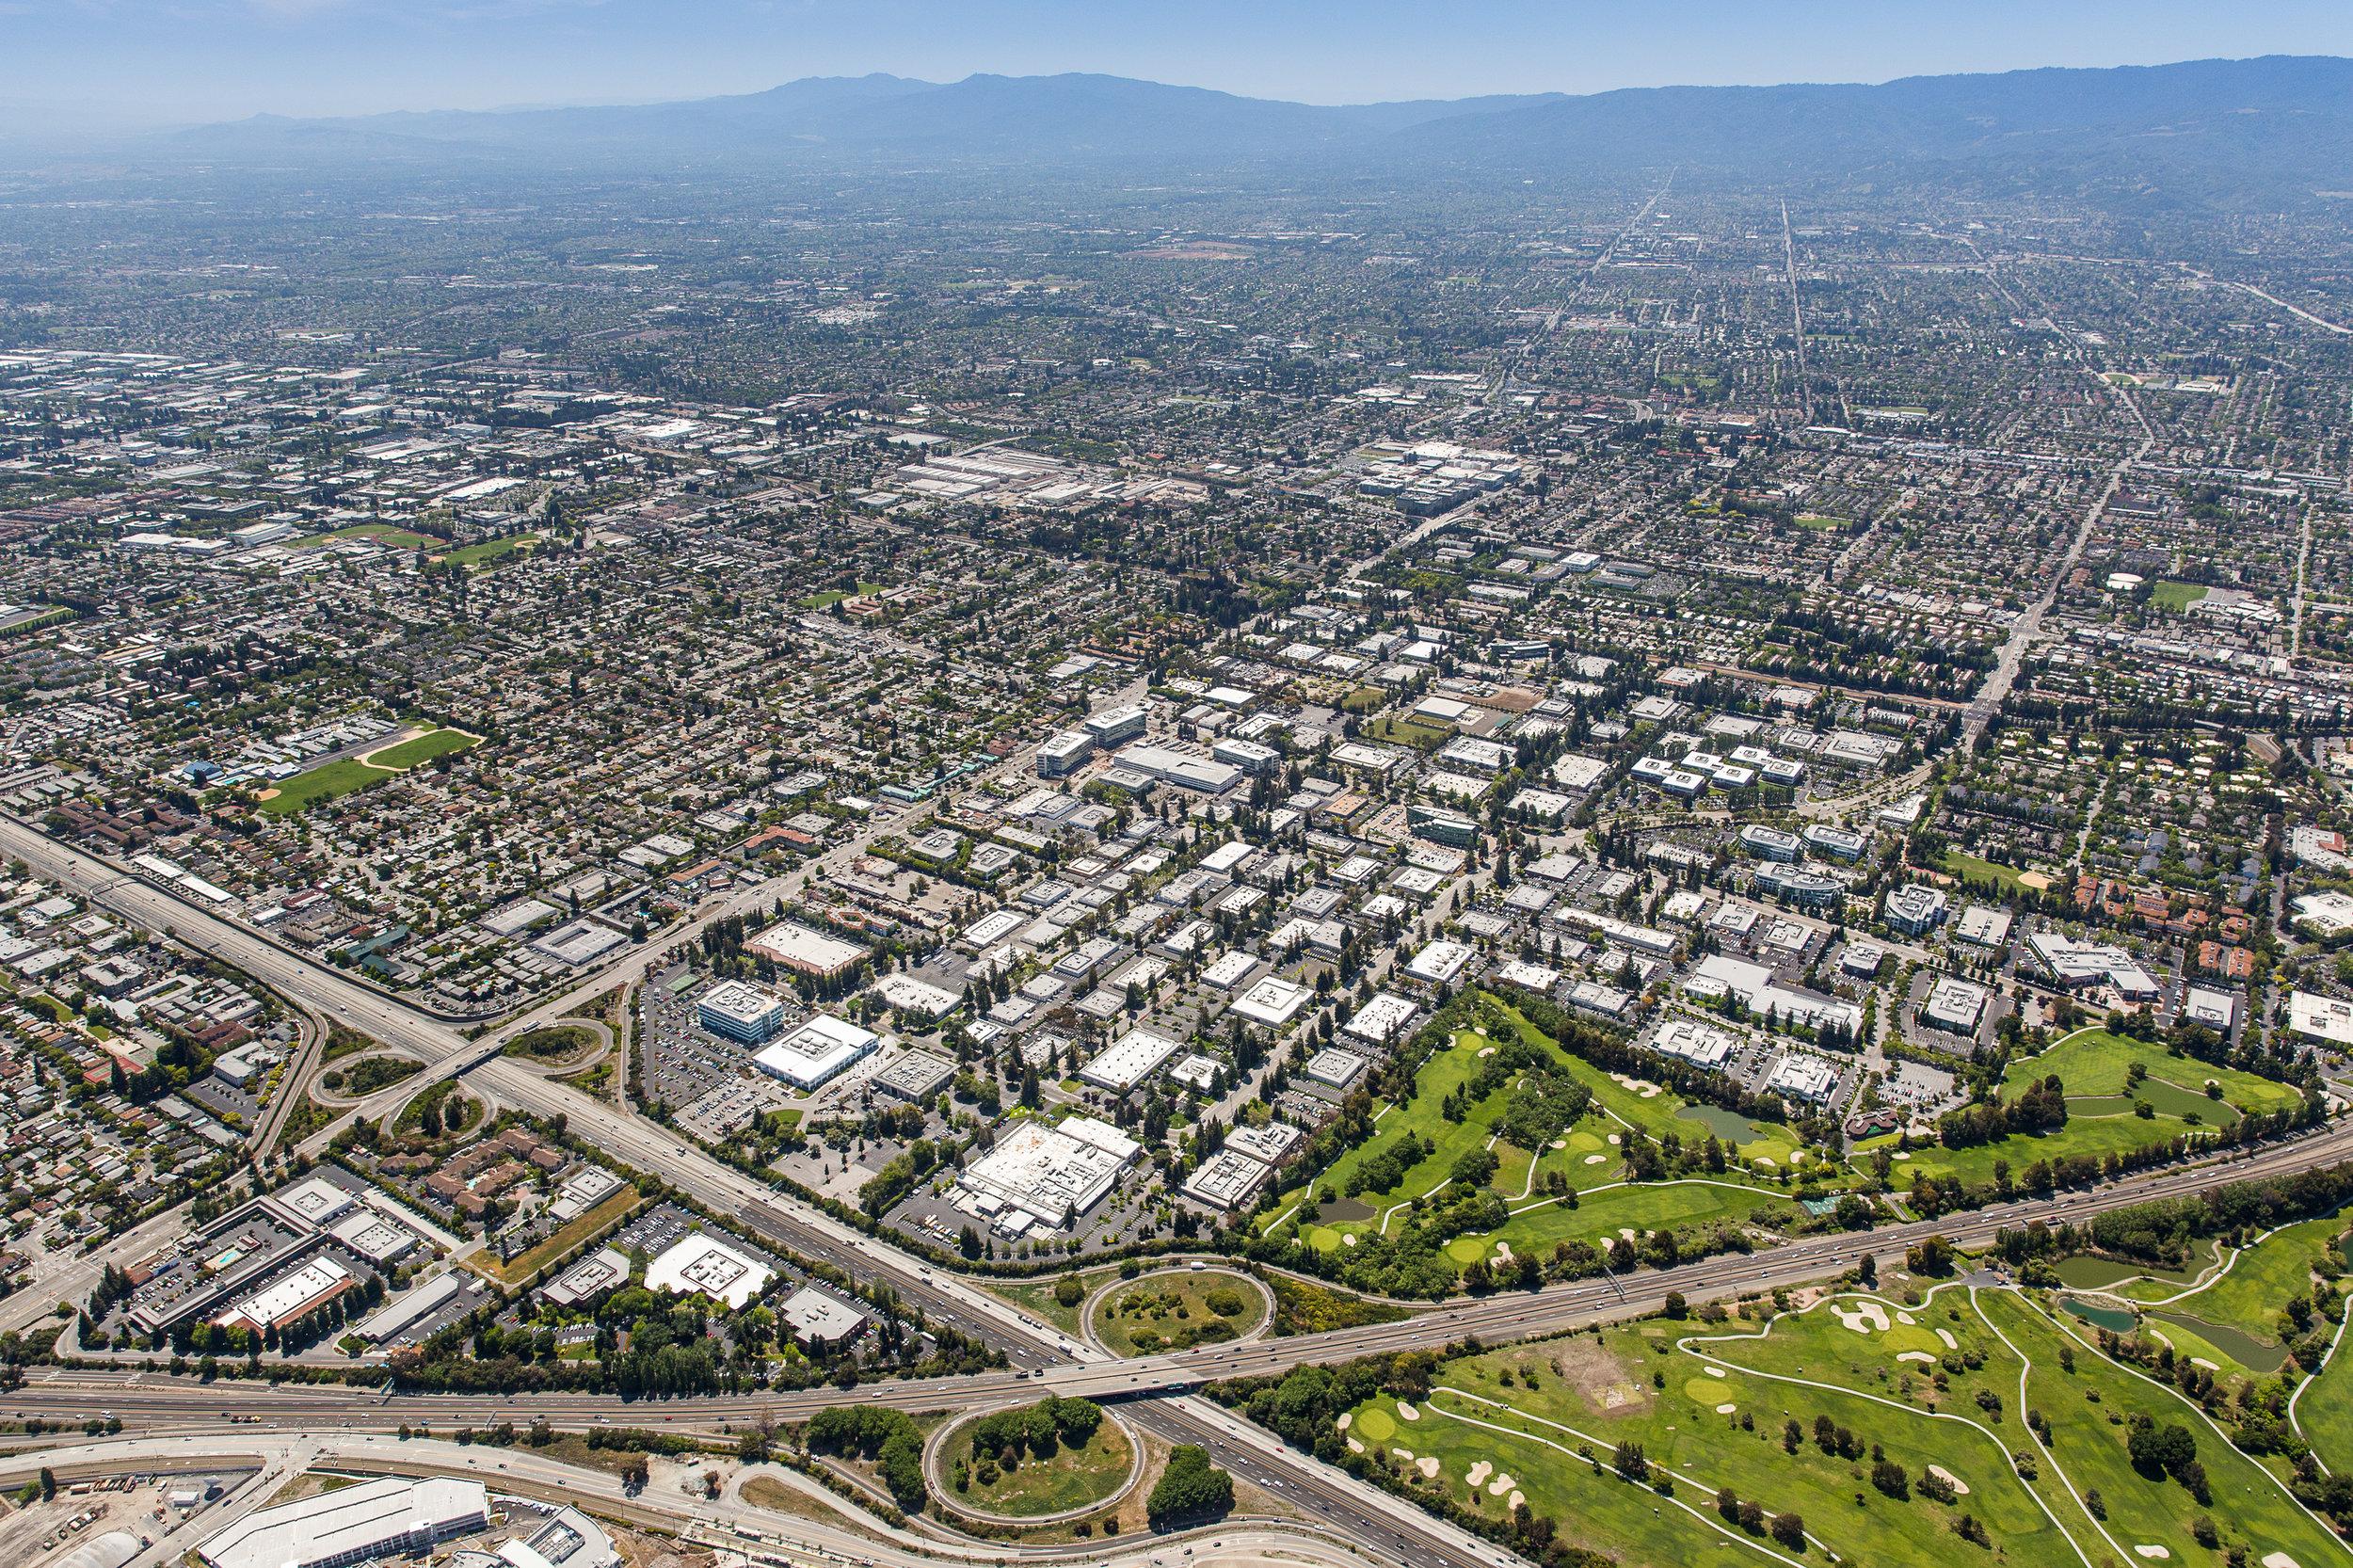 Aerial - Wide View_K1A1700.jpg